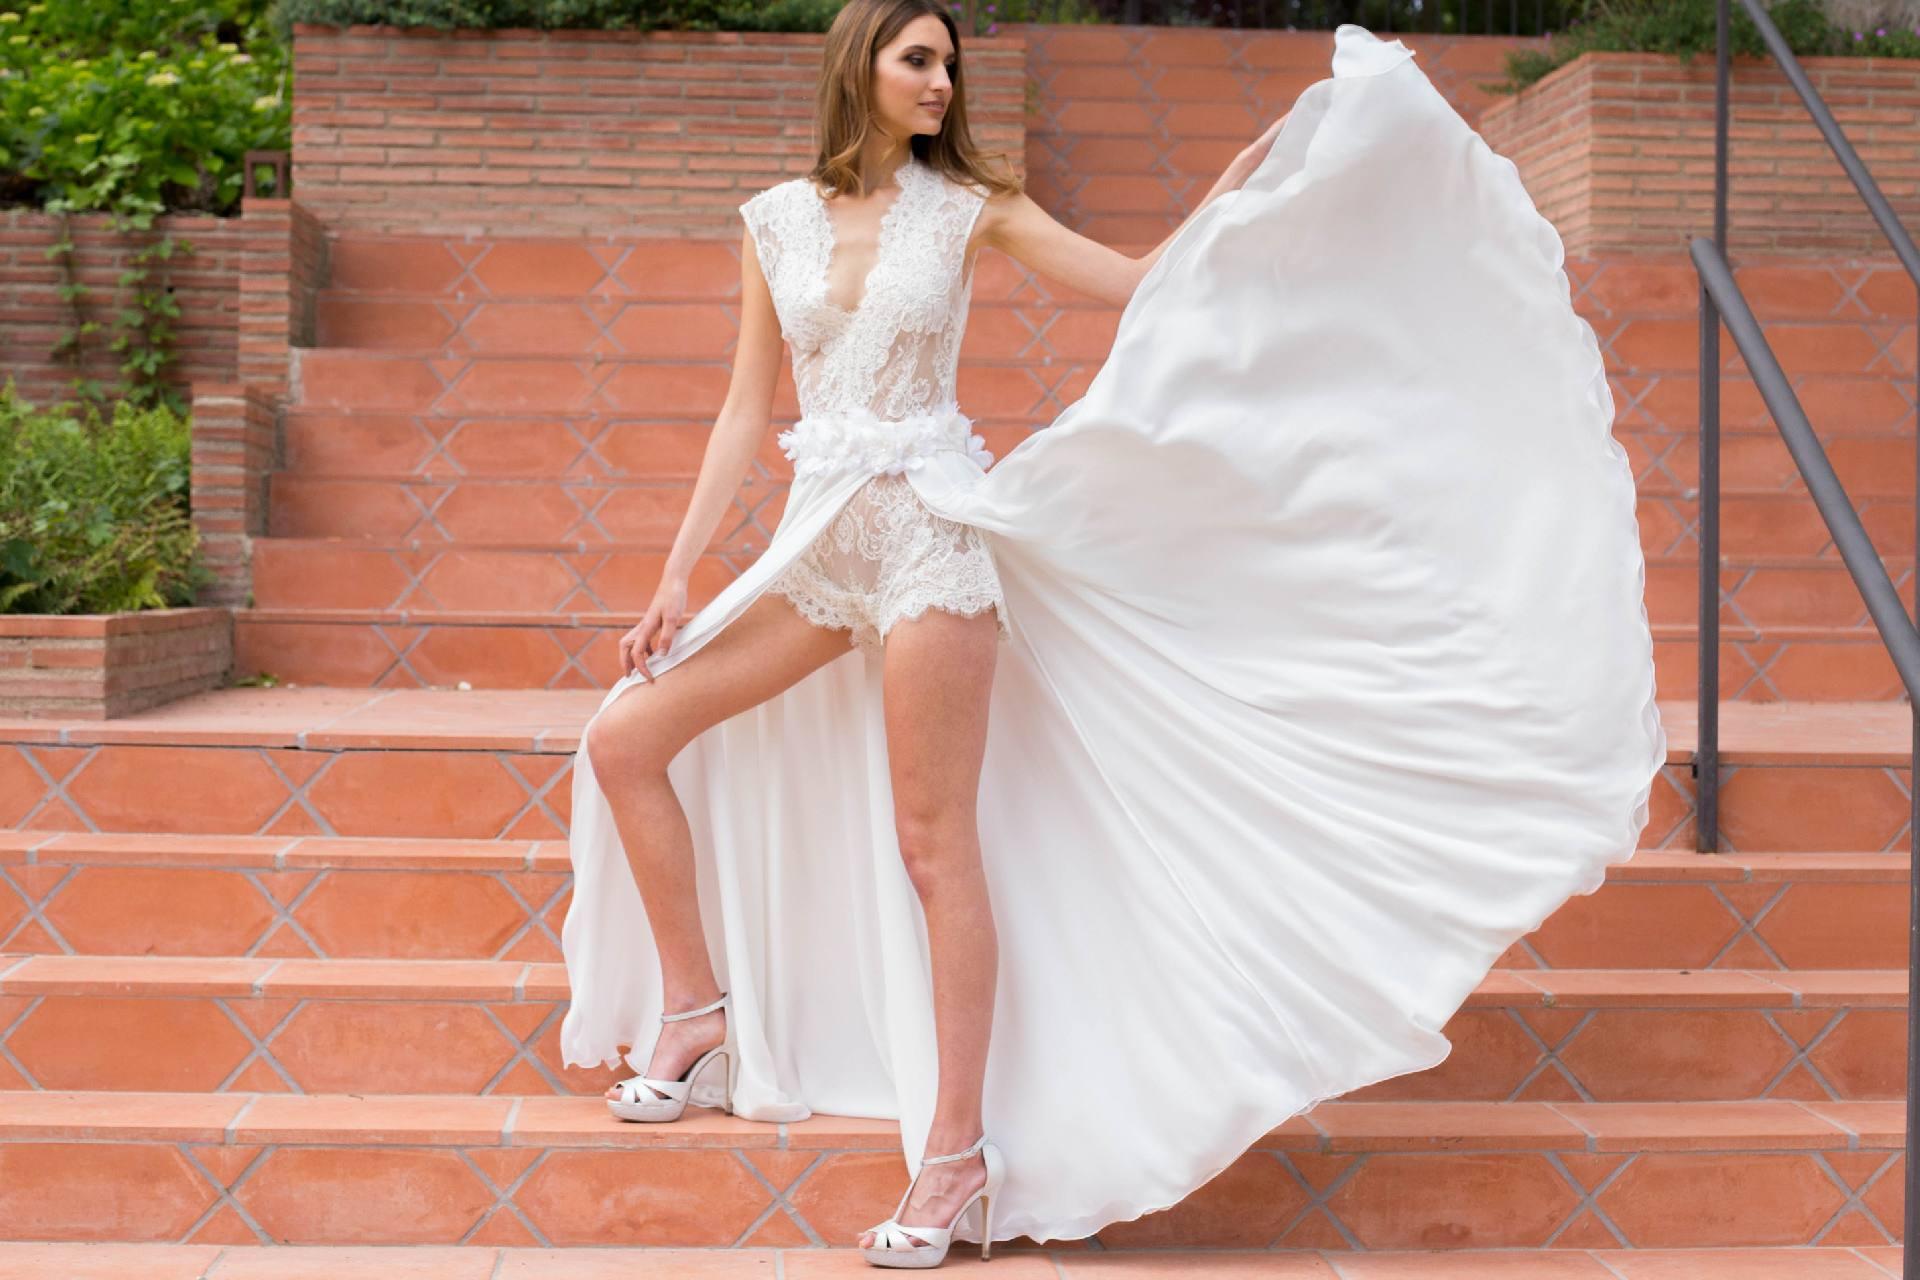 Detalle de vuelo de falda de novia Auril